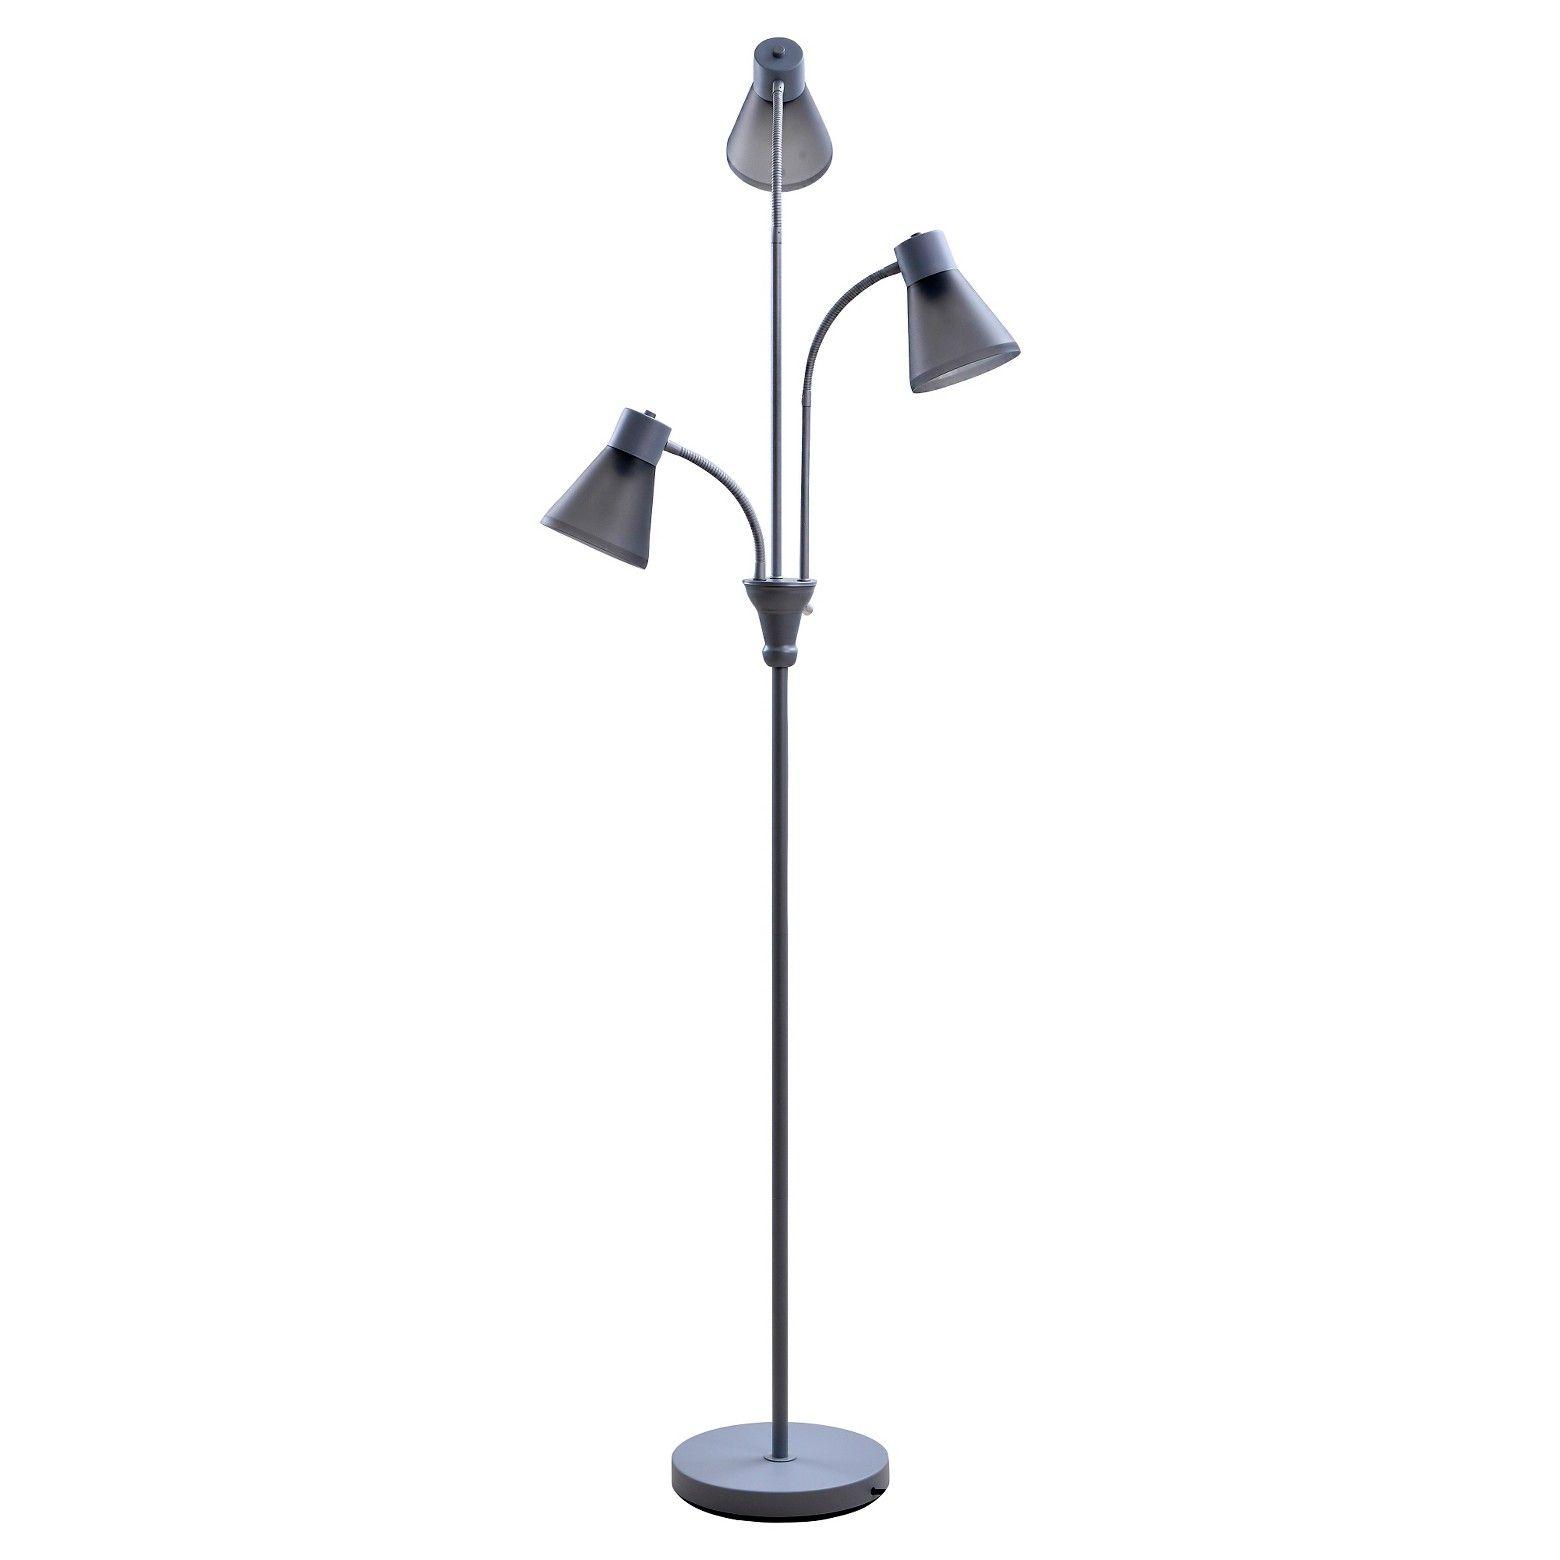 The Multi Head Floor Lamp From Room Essentials Offers Versatile